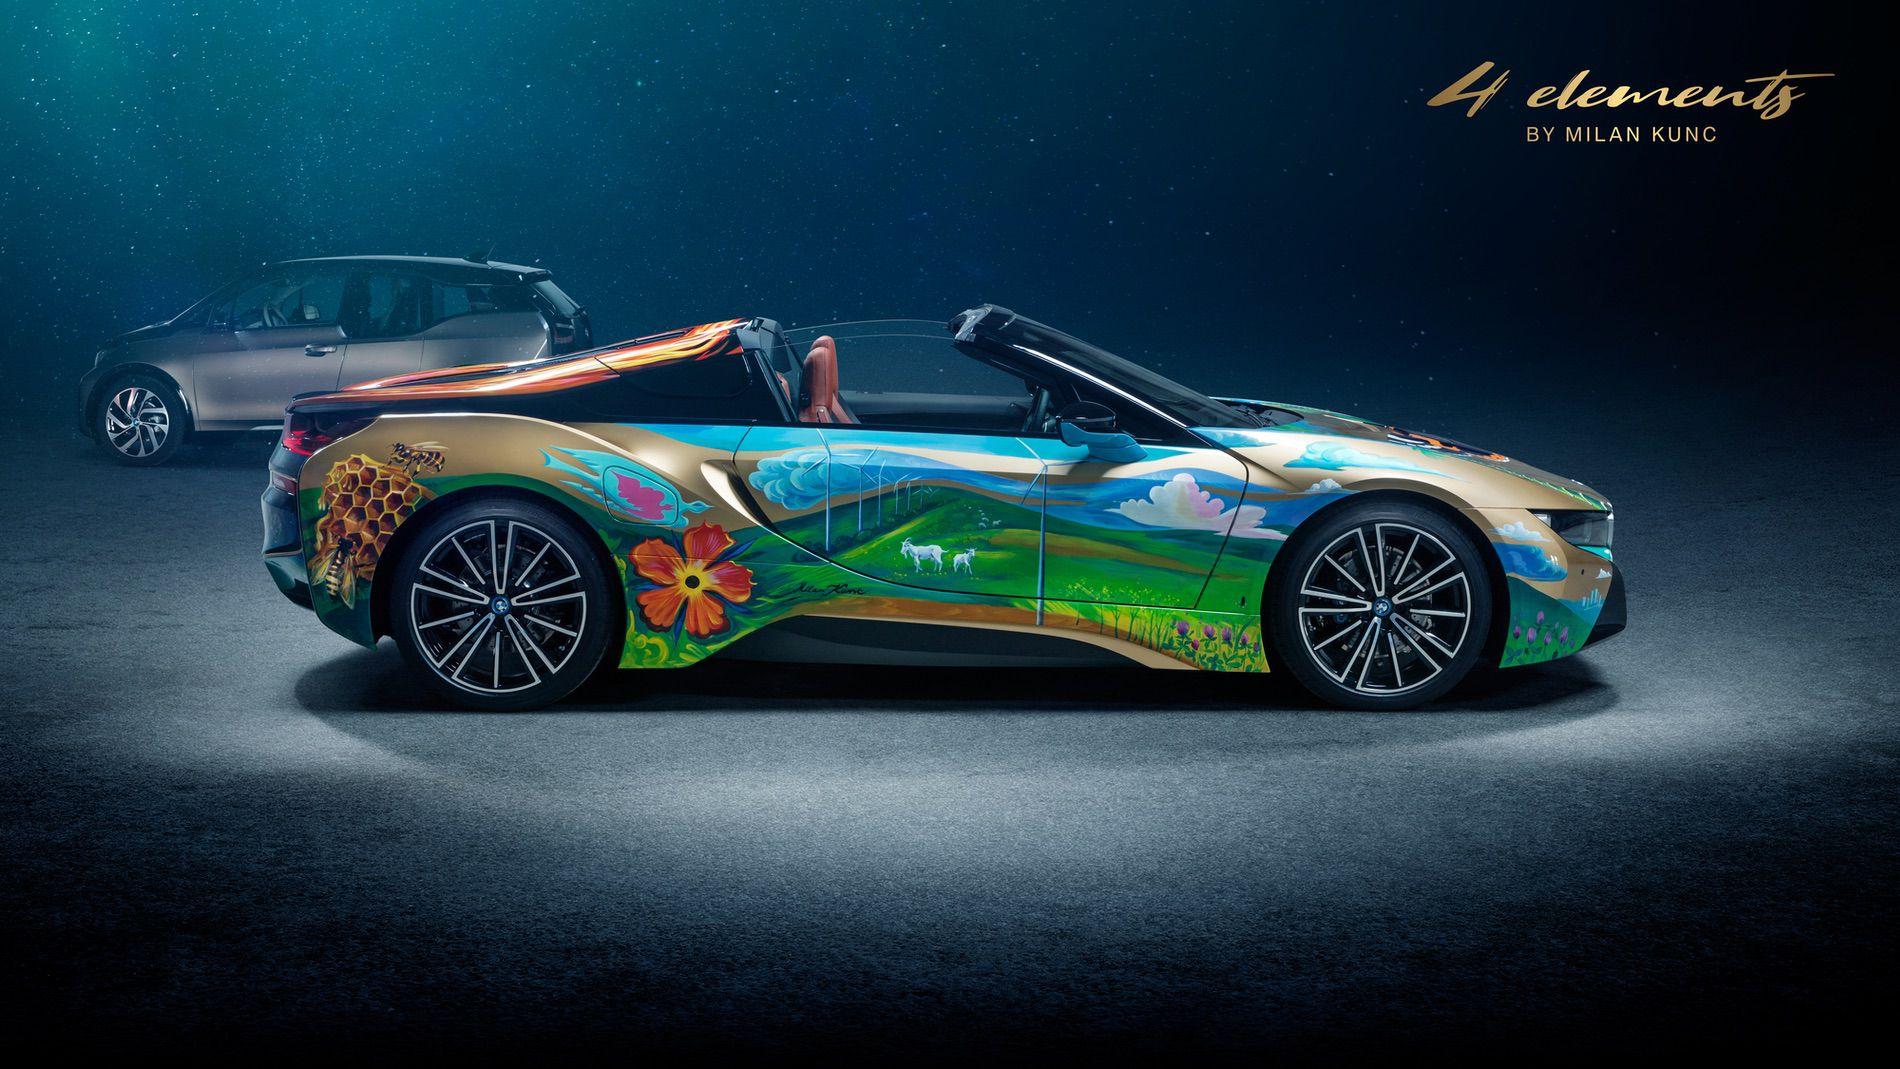 BMW i8 Roadster 4 Elements Art Car by Milan Kunc (3)